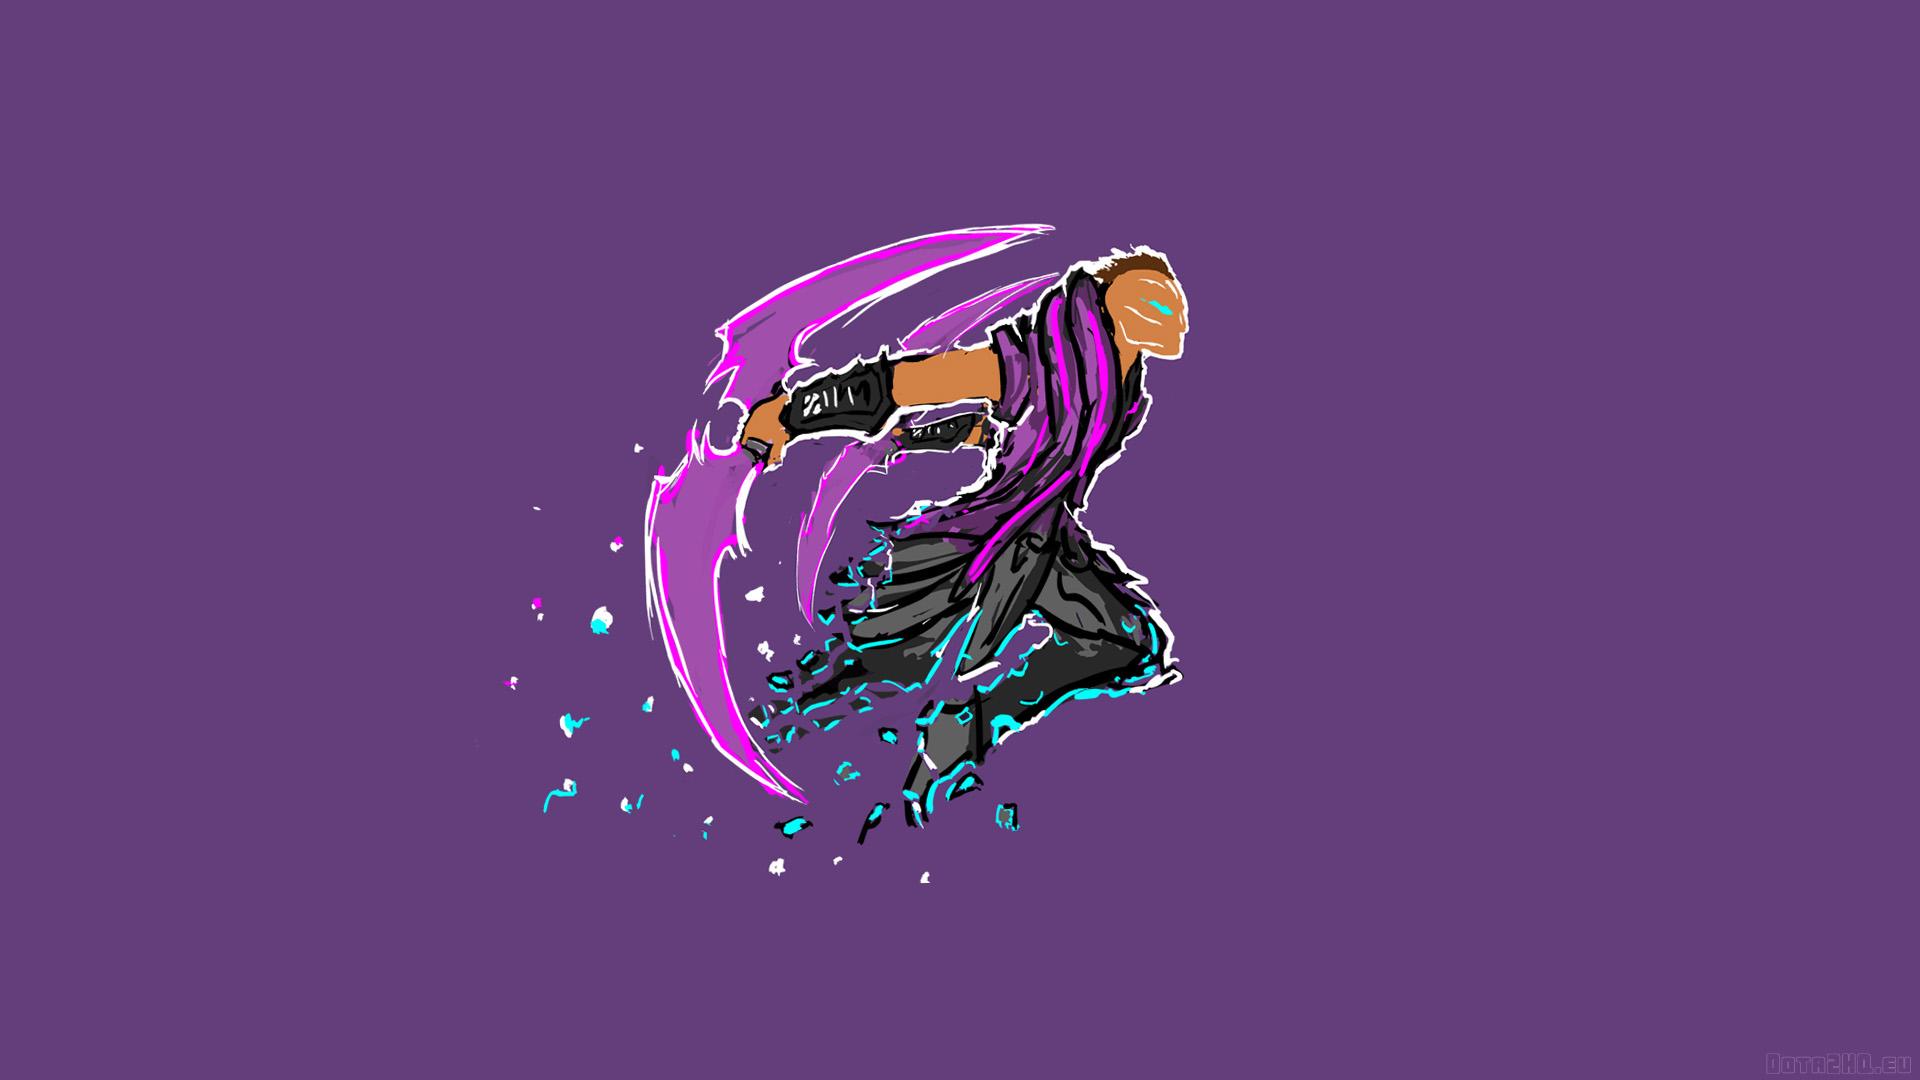 Wallpaper illustration purple text cartoon dota 2 anti mage illustration purple text cartoon dota 2 anti mage art human body font organ voltagebd Images